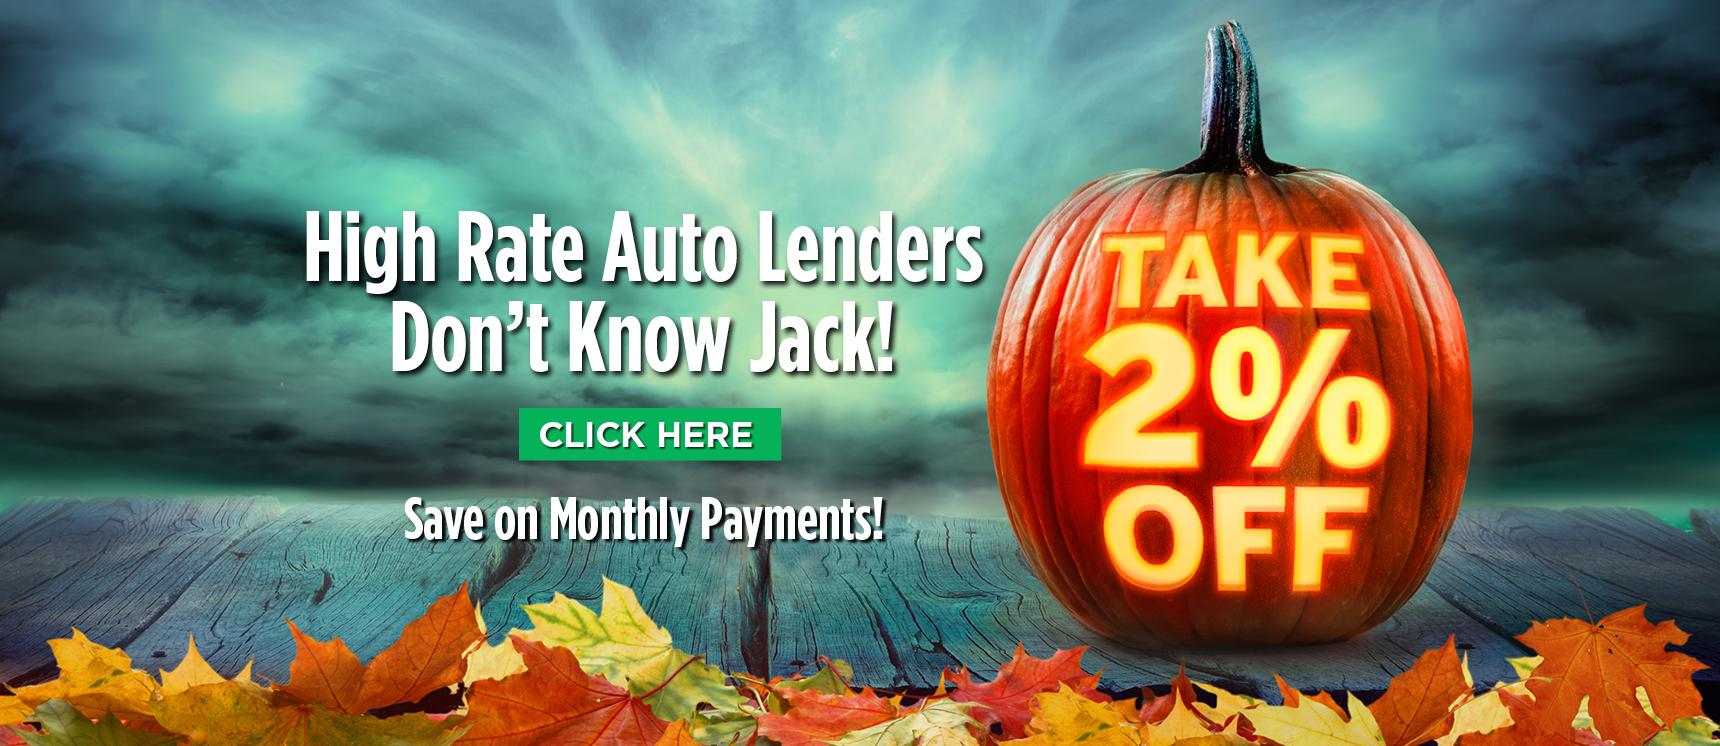 Pumpkin image promoting 2% off auto loan promotion